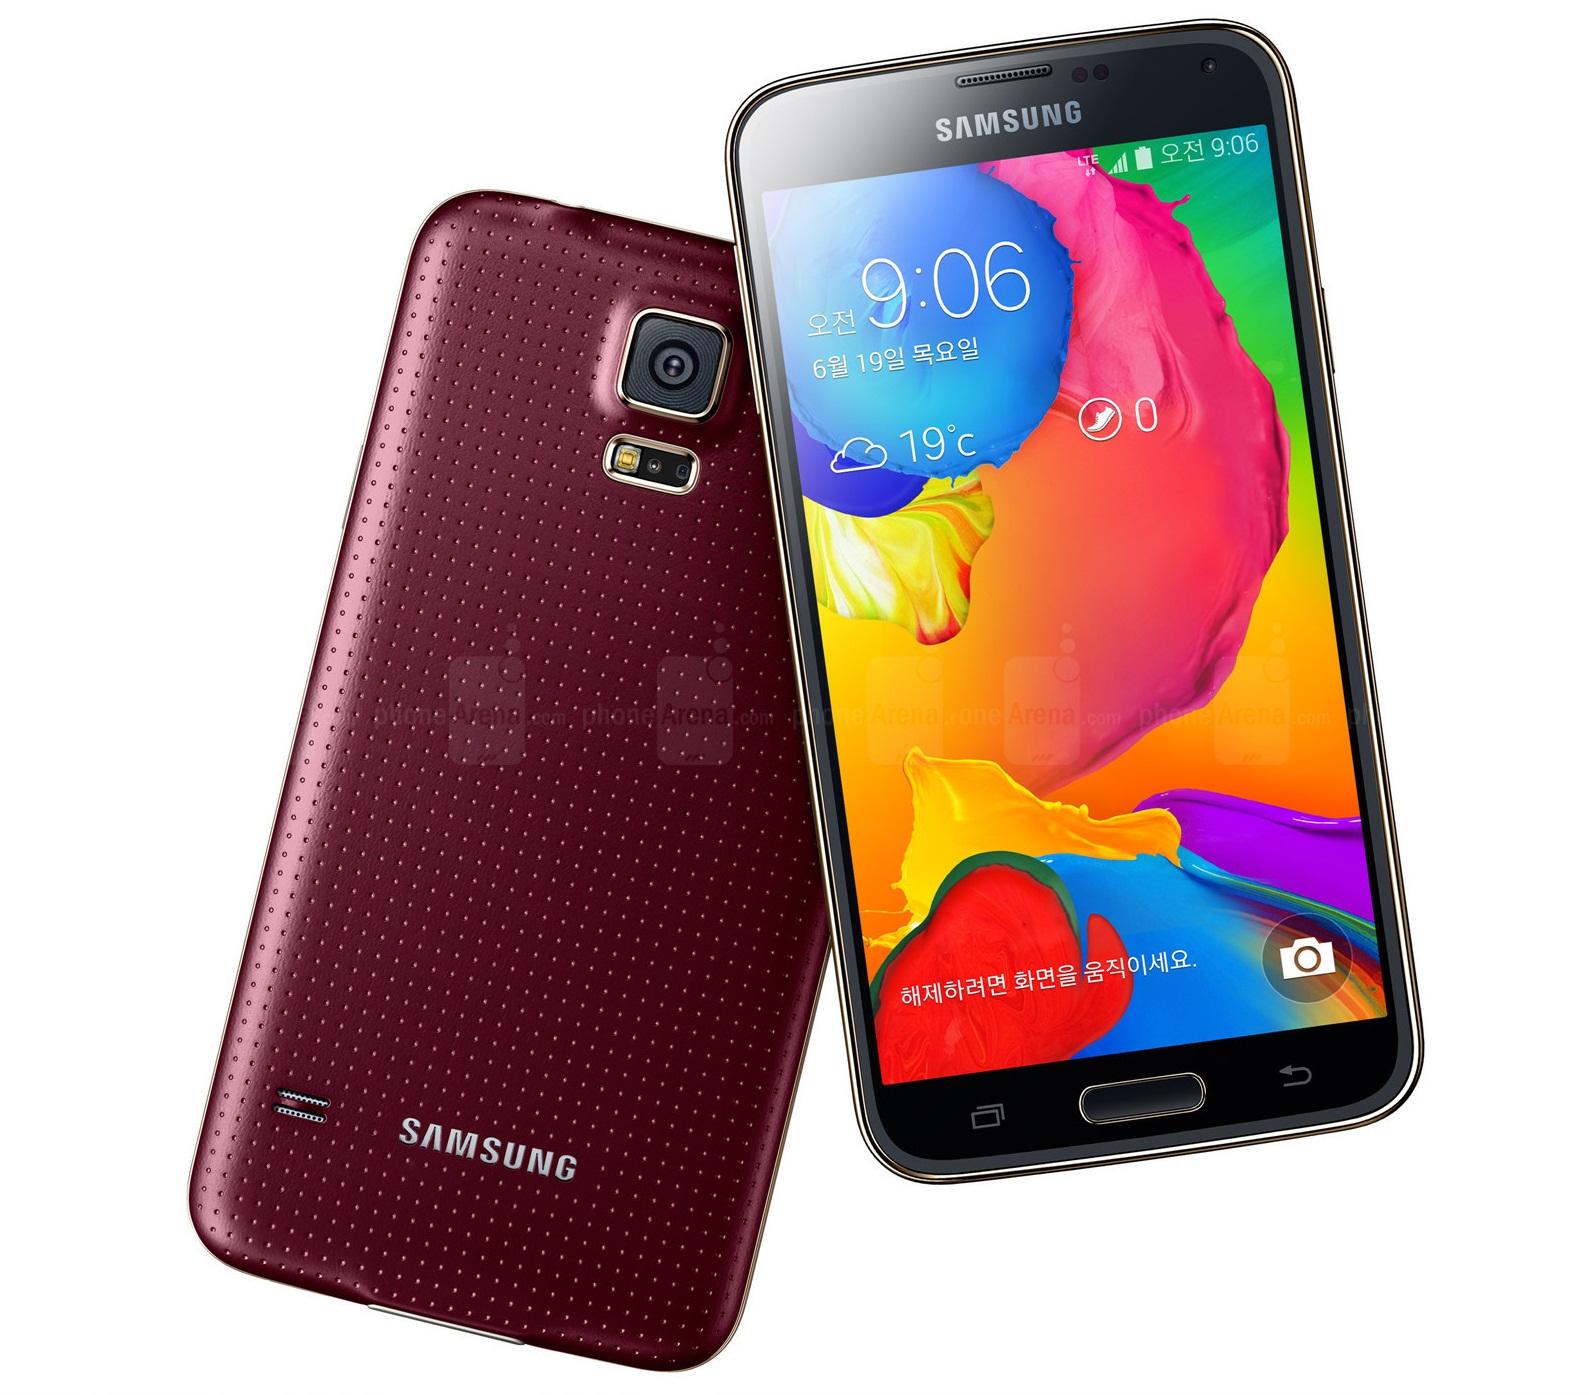 Galaxy S5 Quad HD LTE-A Hanya Sedikit Lebih Mahal dari S5 Biasa